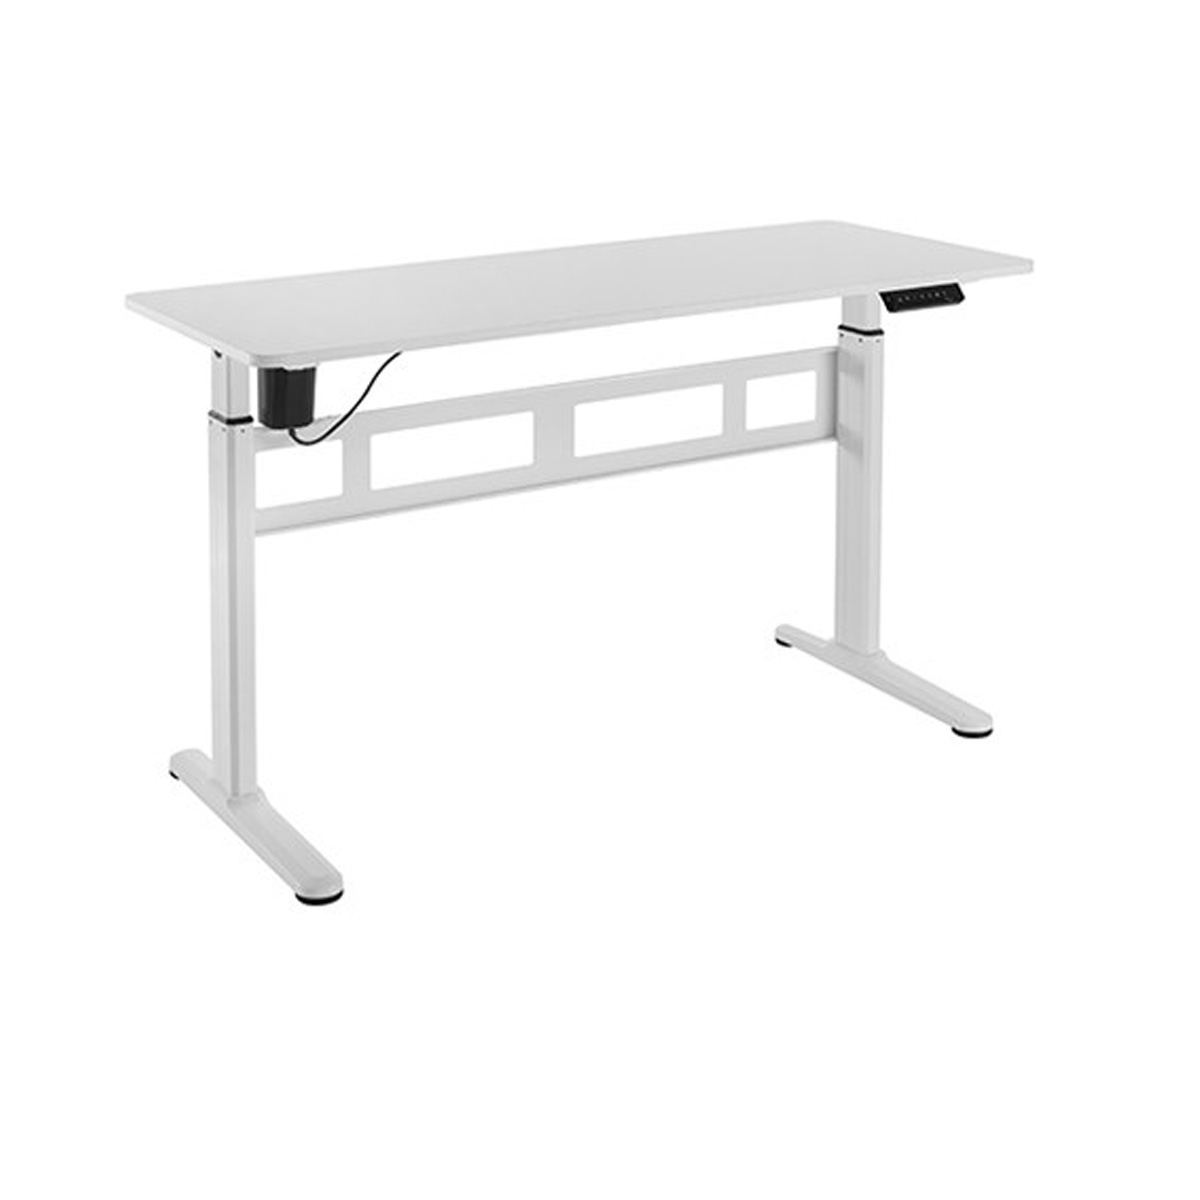 FS-OD55M-WH White Motorized Desk